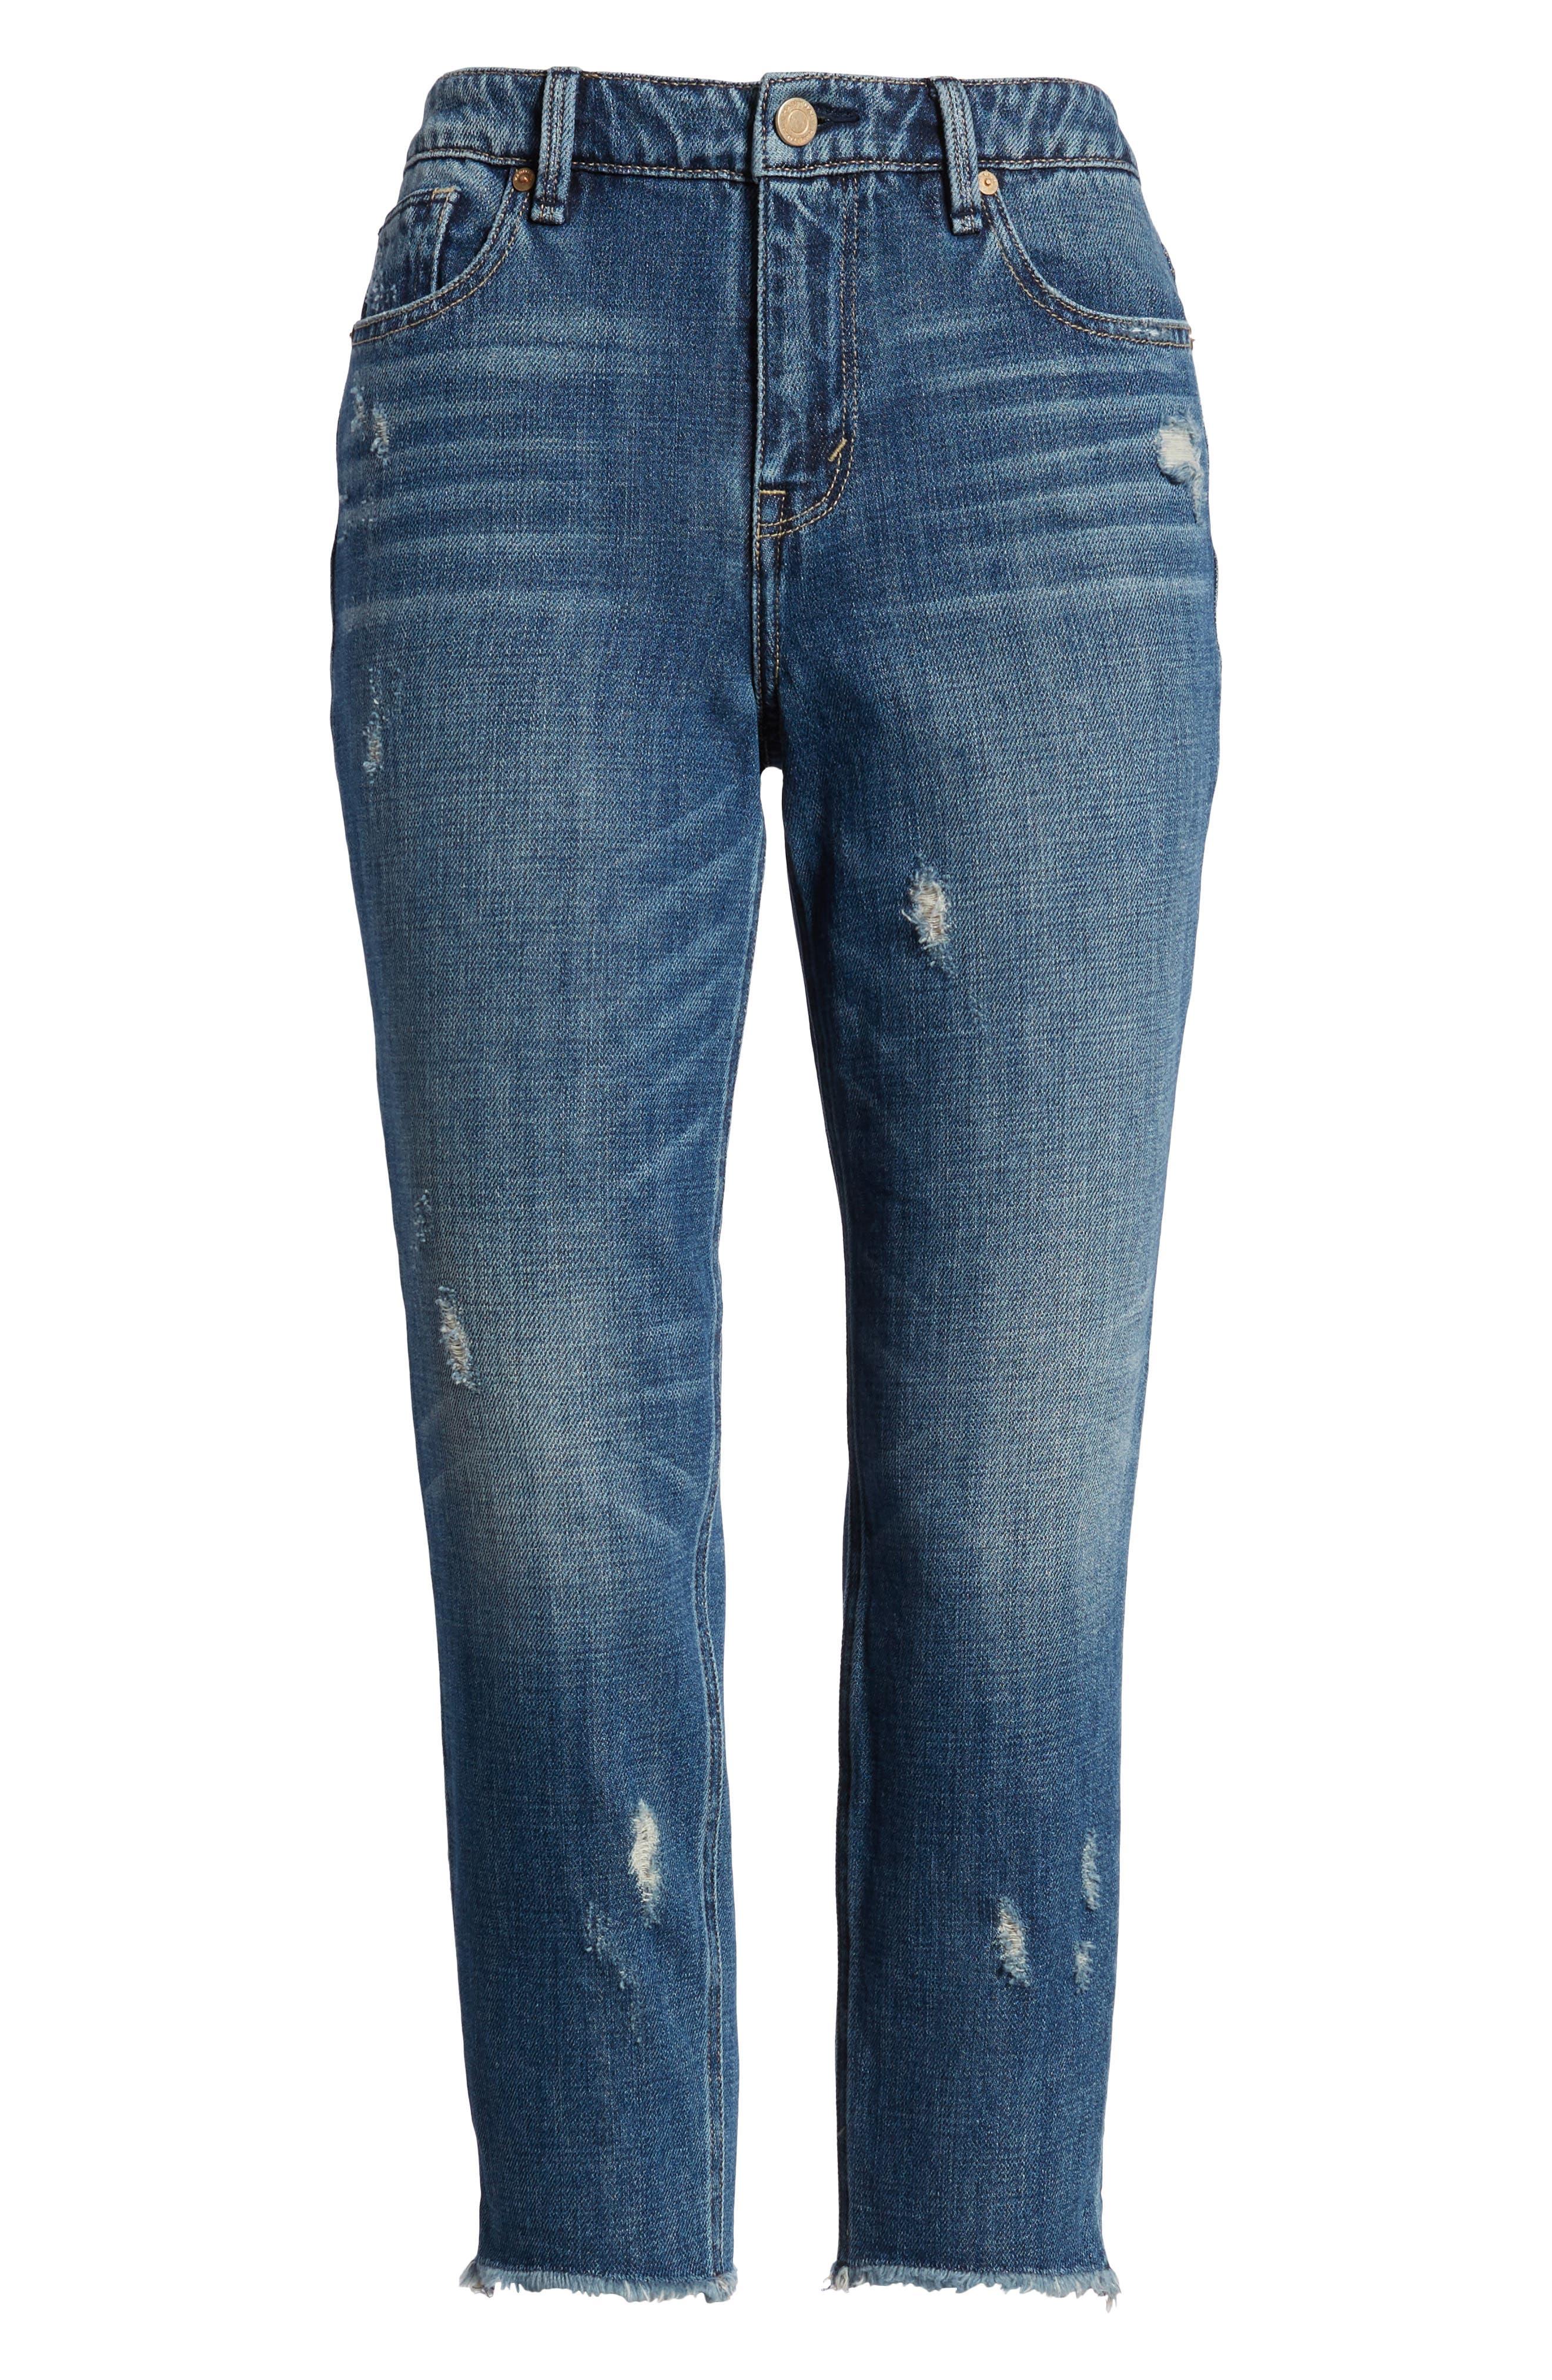 Vale Slant Fray Hem Jeans,                             Alternate thumbnail 7, color,                             Lowell